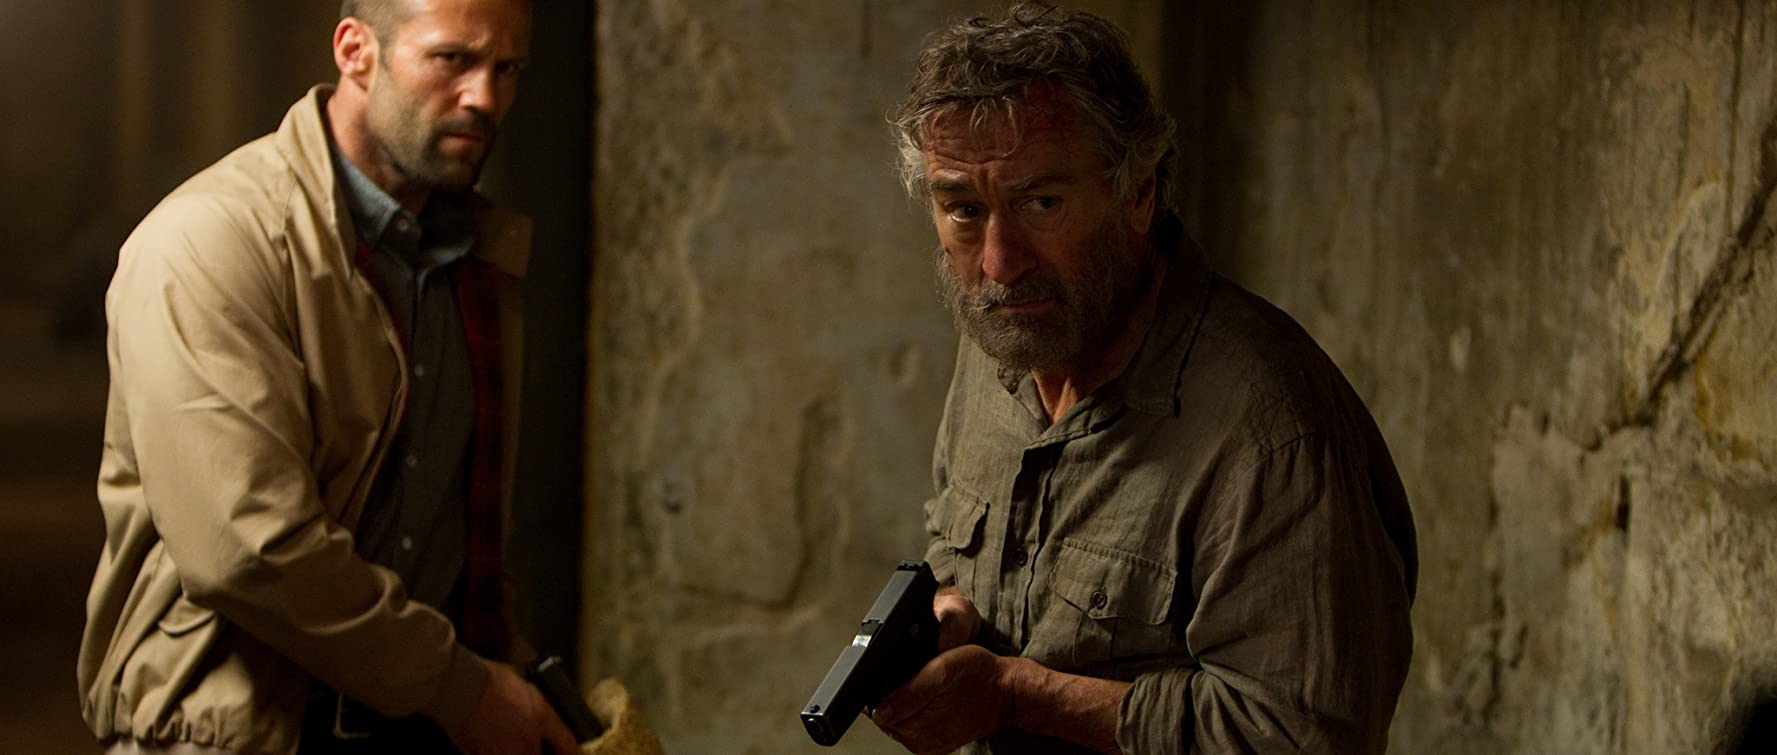 Robert De Niro and Jason Statham in Killer Elite (2011)